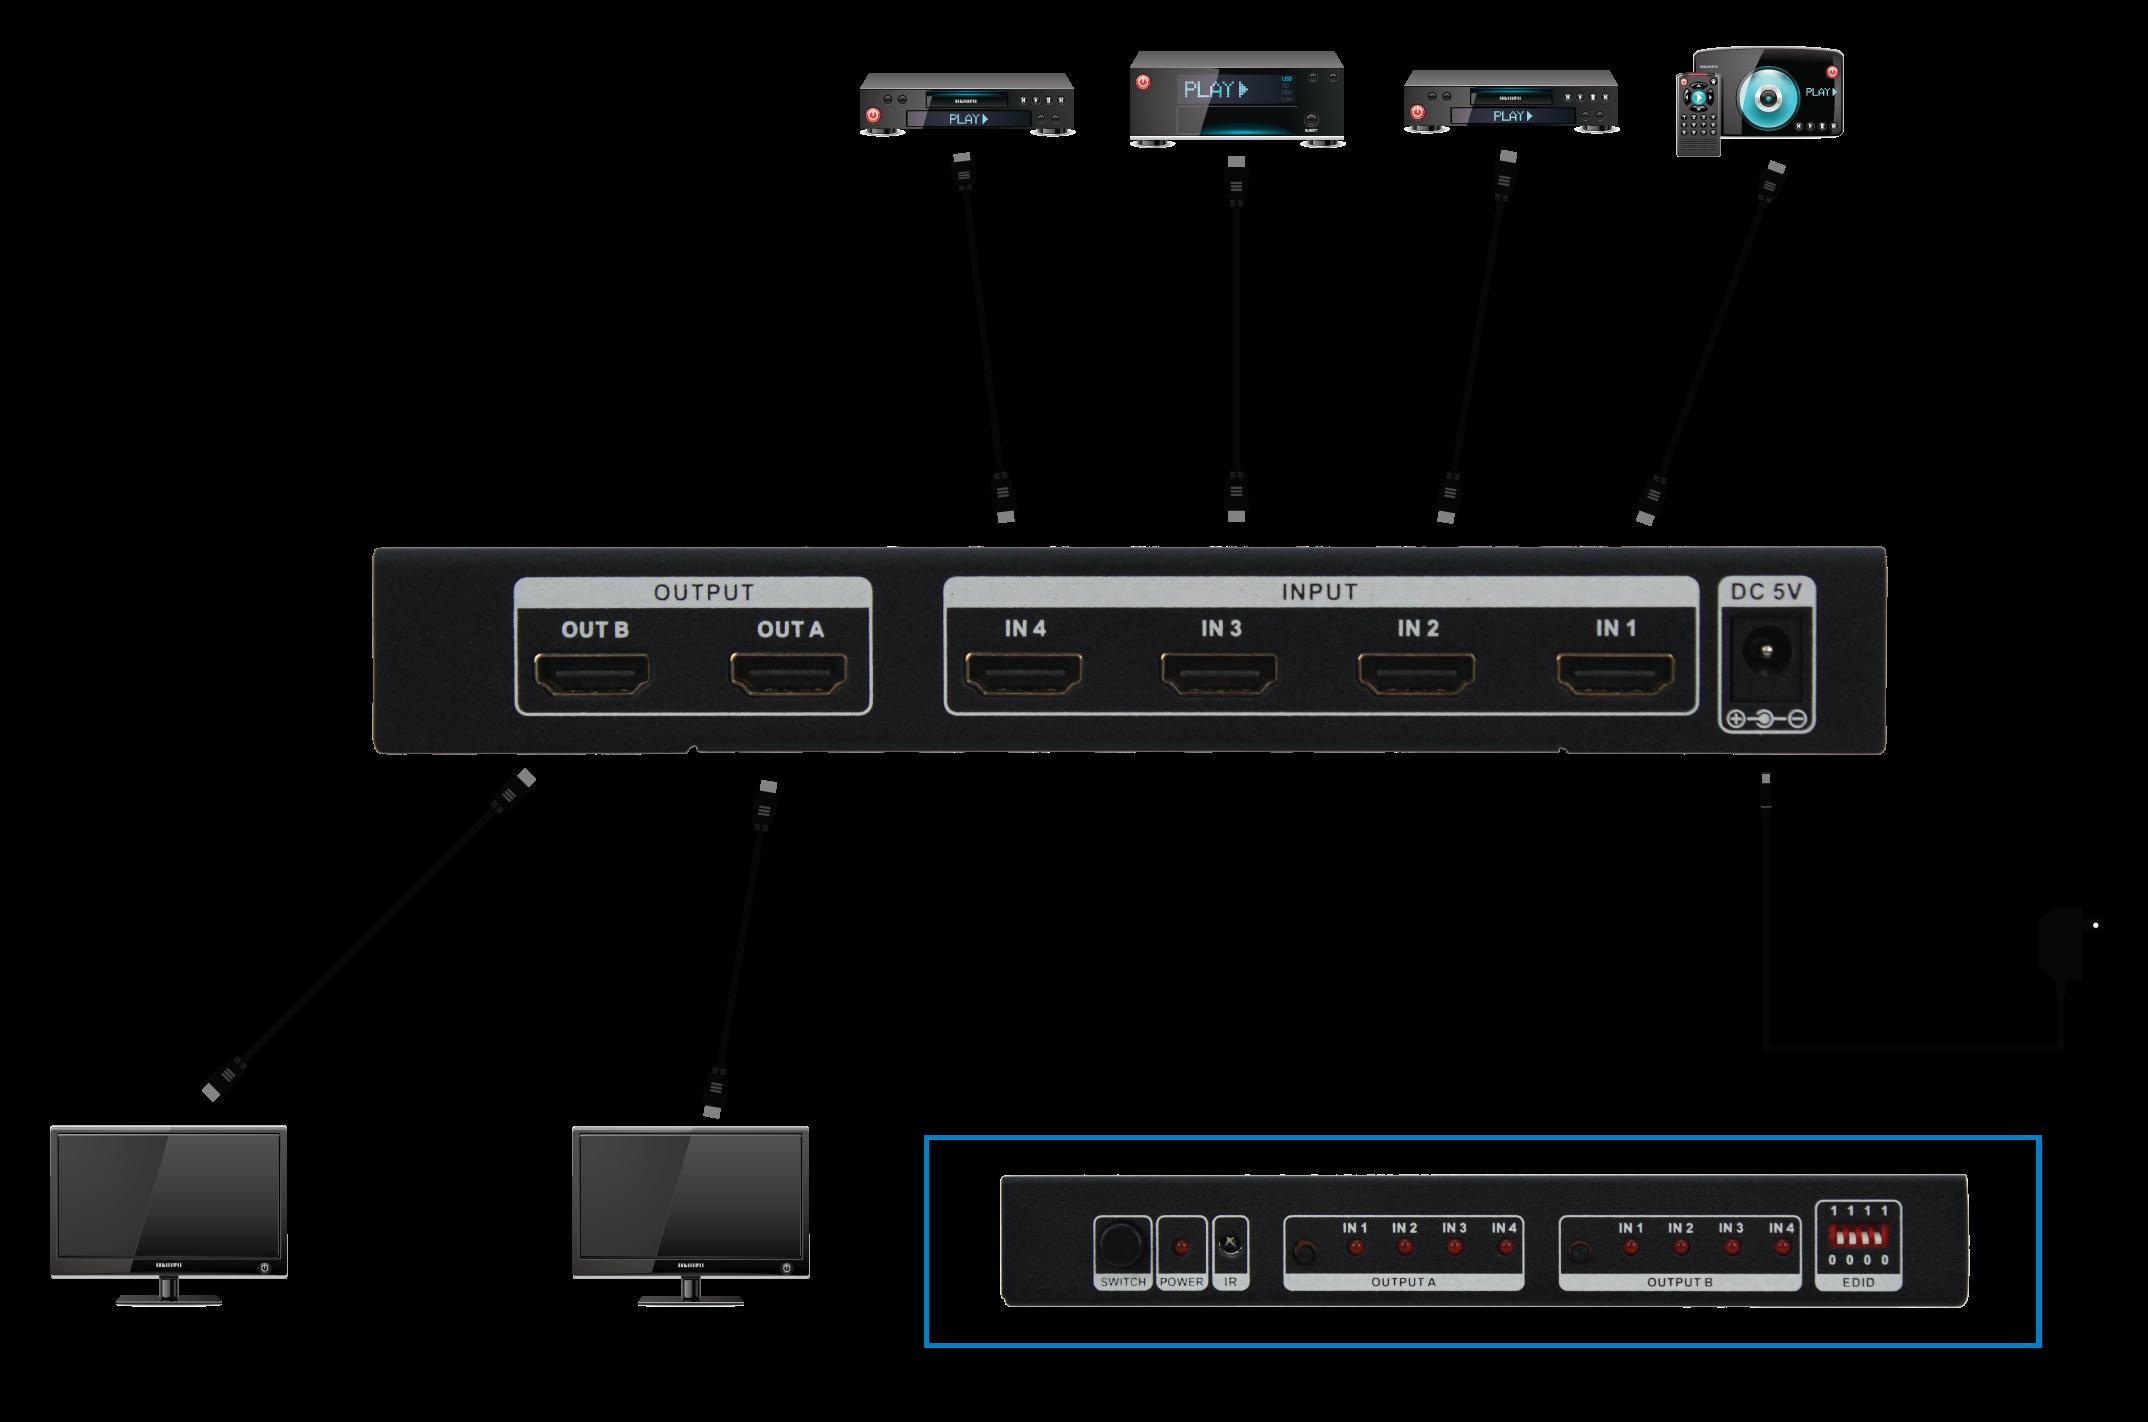 h4x2-4k-application.png